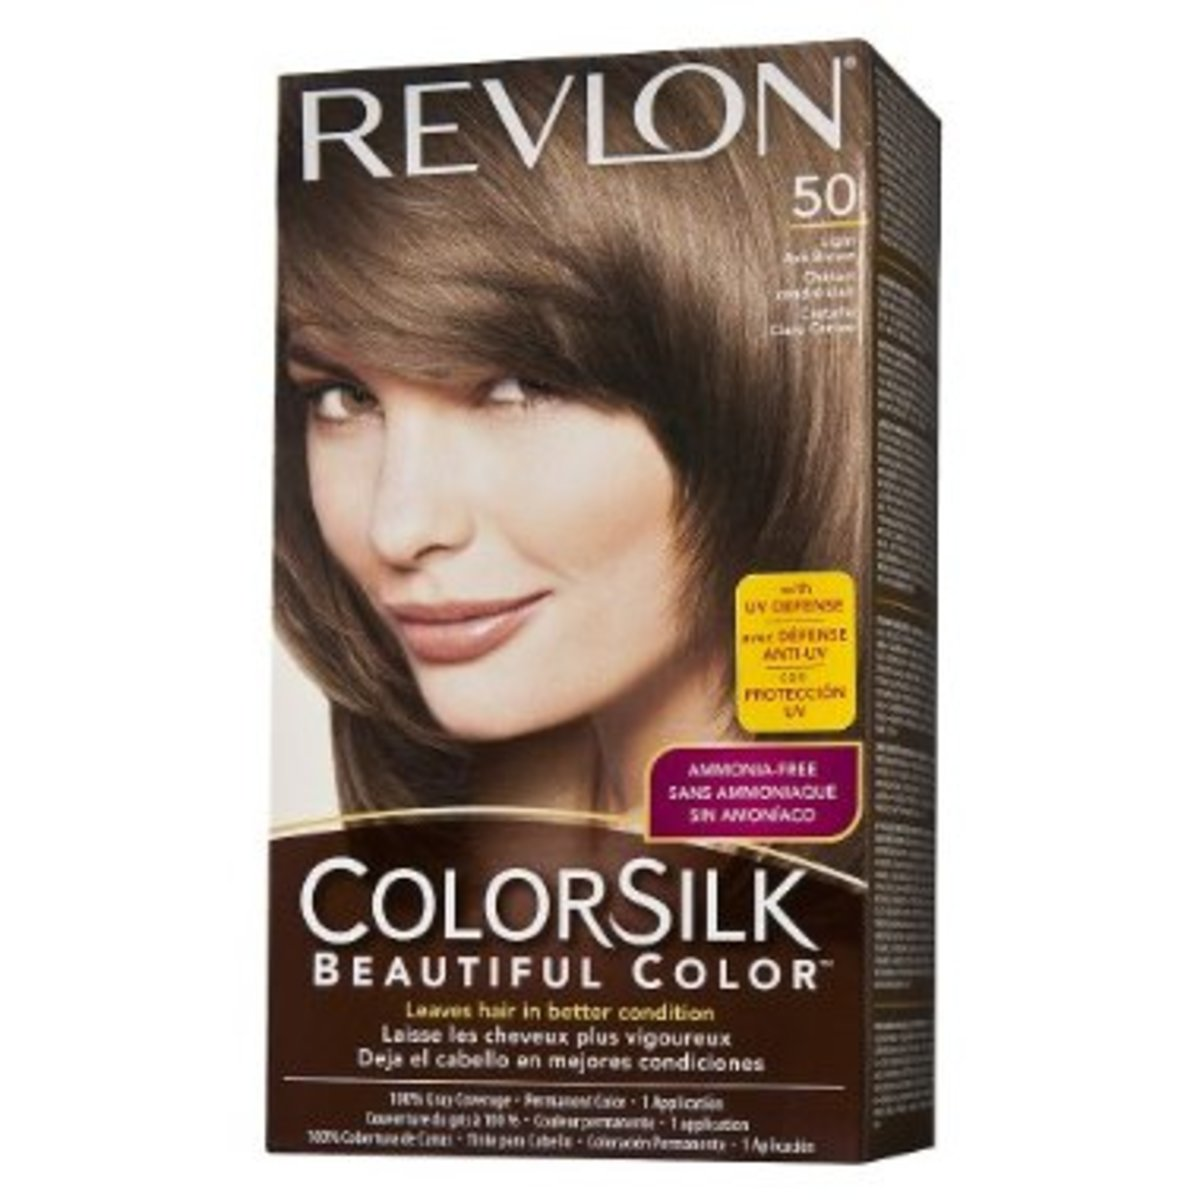 Revlon ColorSilk light ash brown